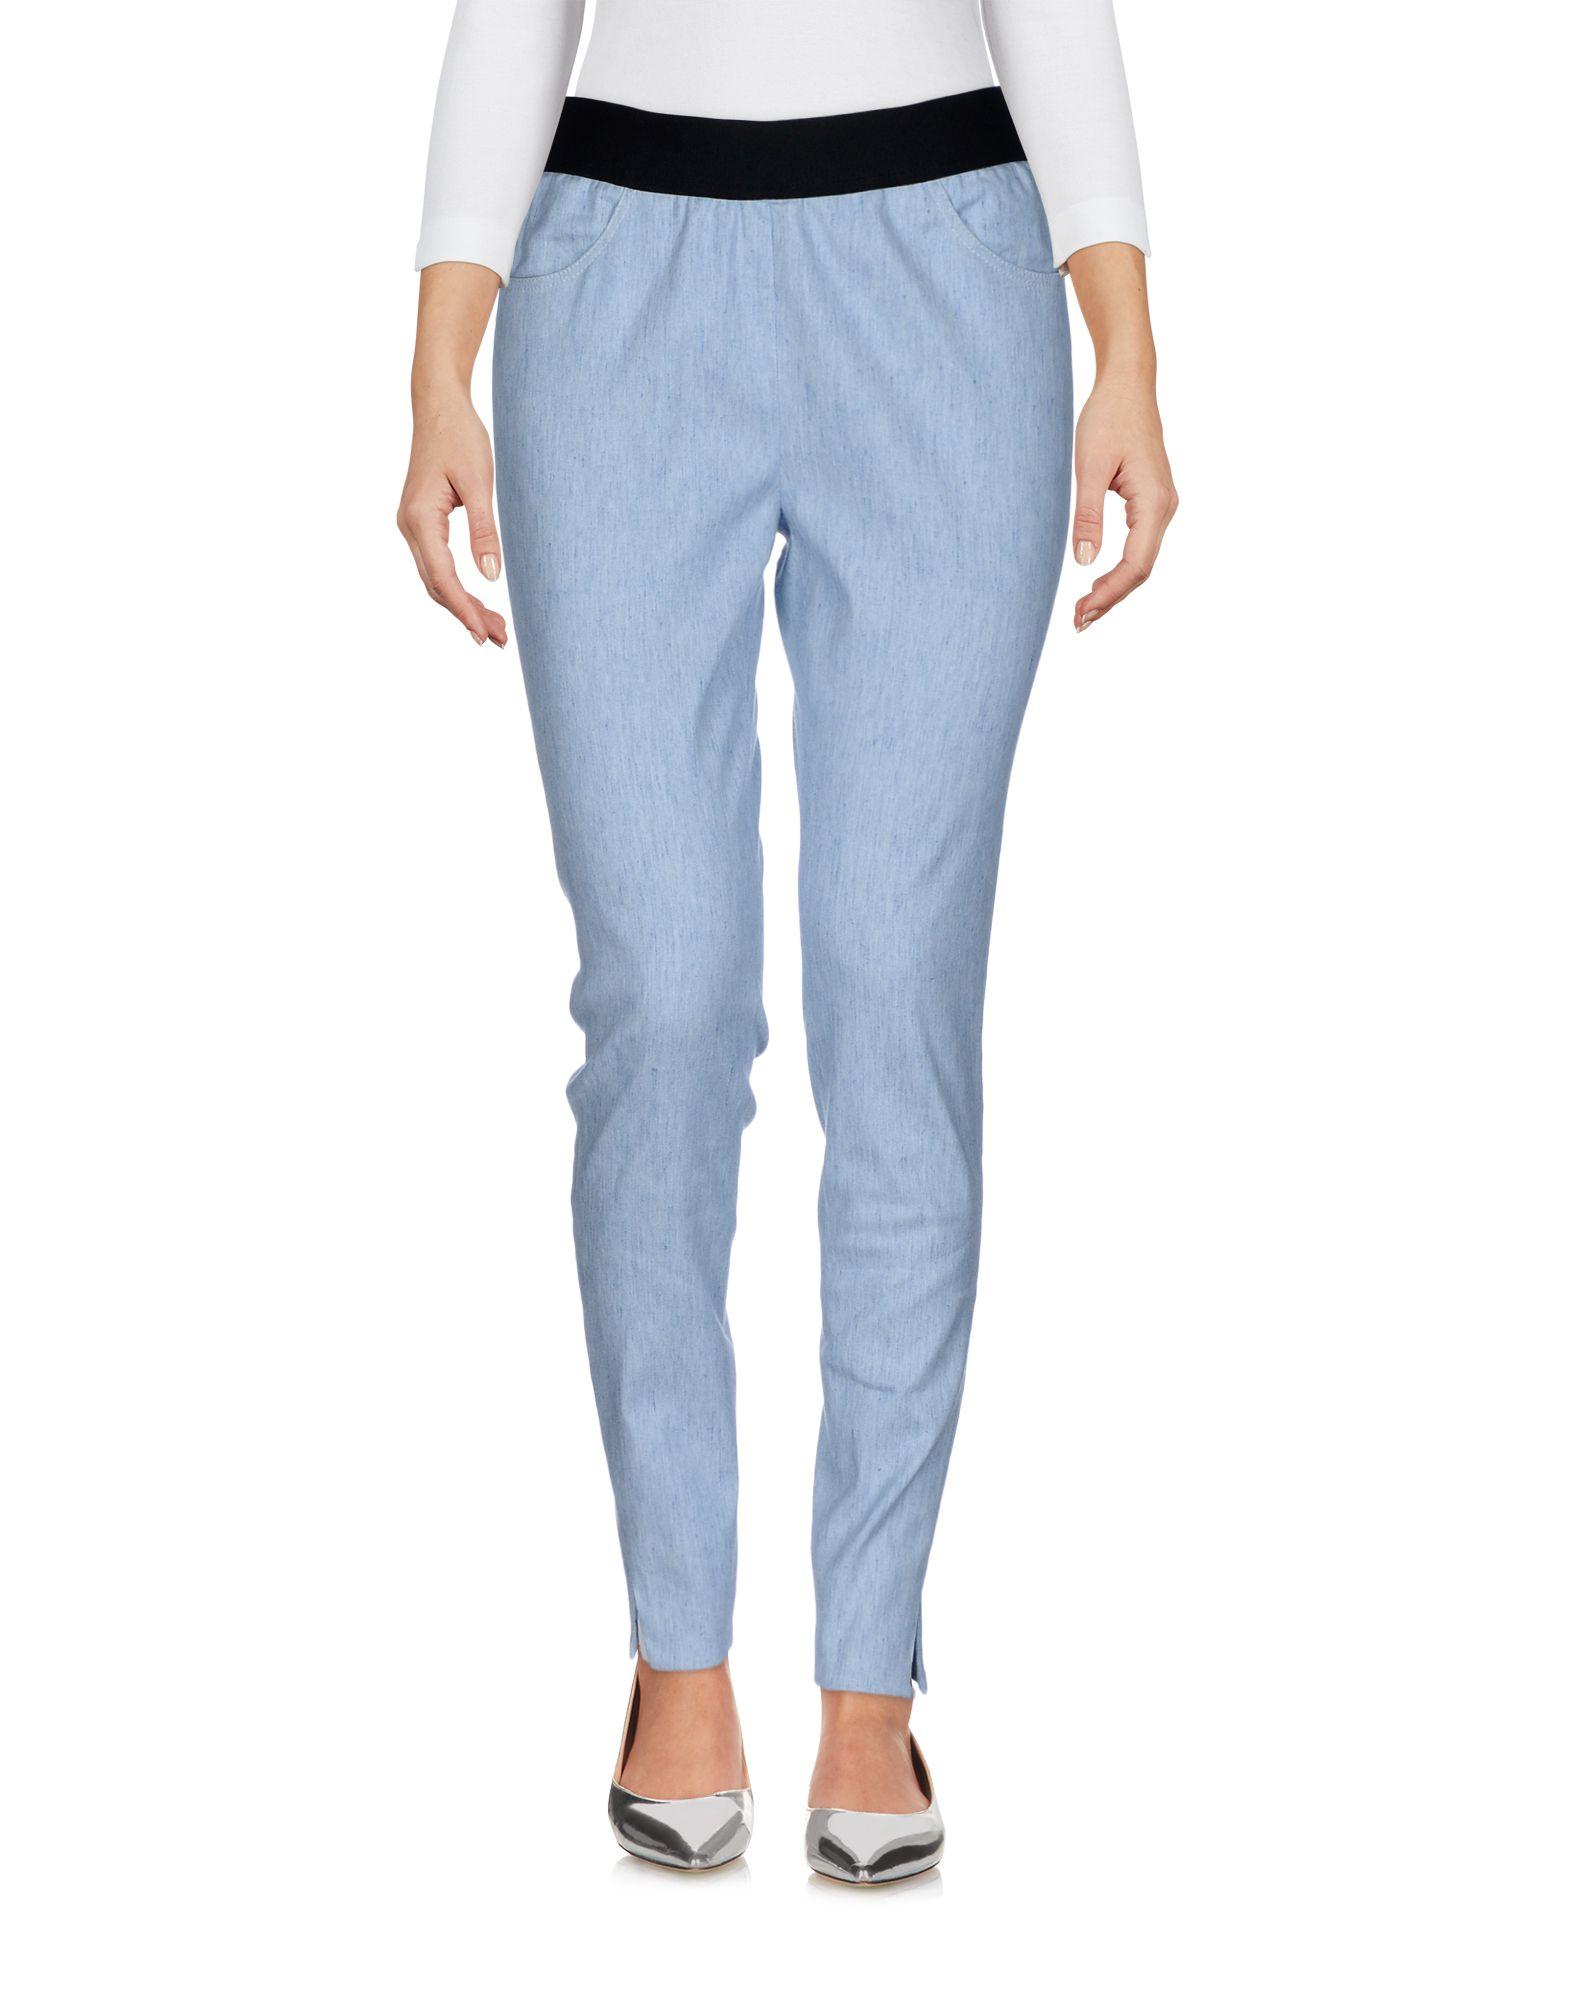 Pantaloni Jeans New York Industrie Donna - Acquista online su jsrEjan6sh